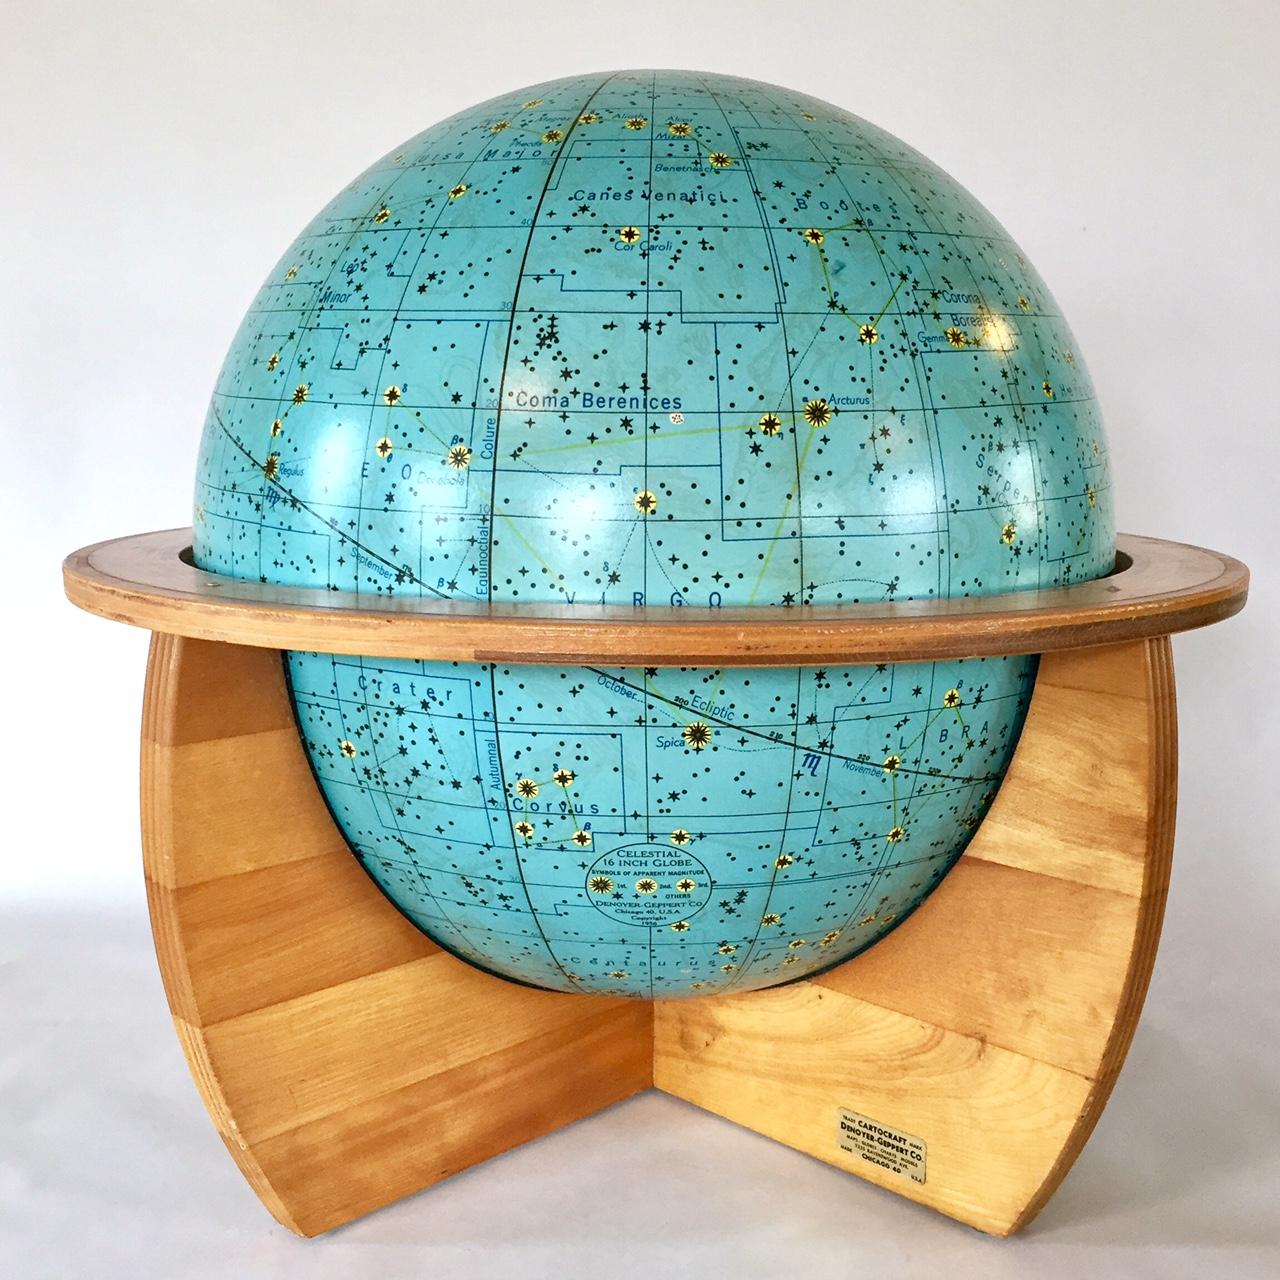 Space Age - Vintage globes dating between 1948 - 1979